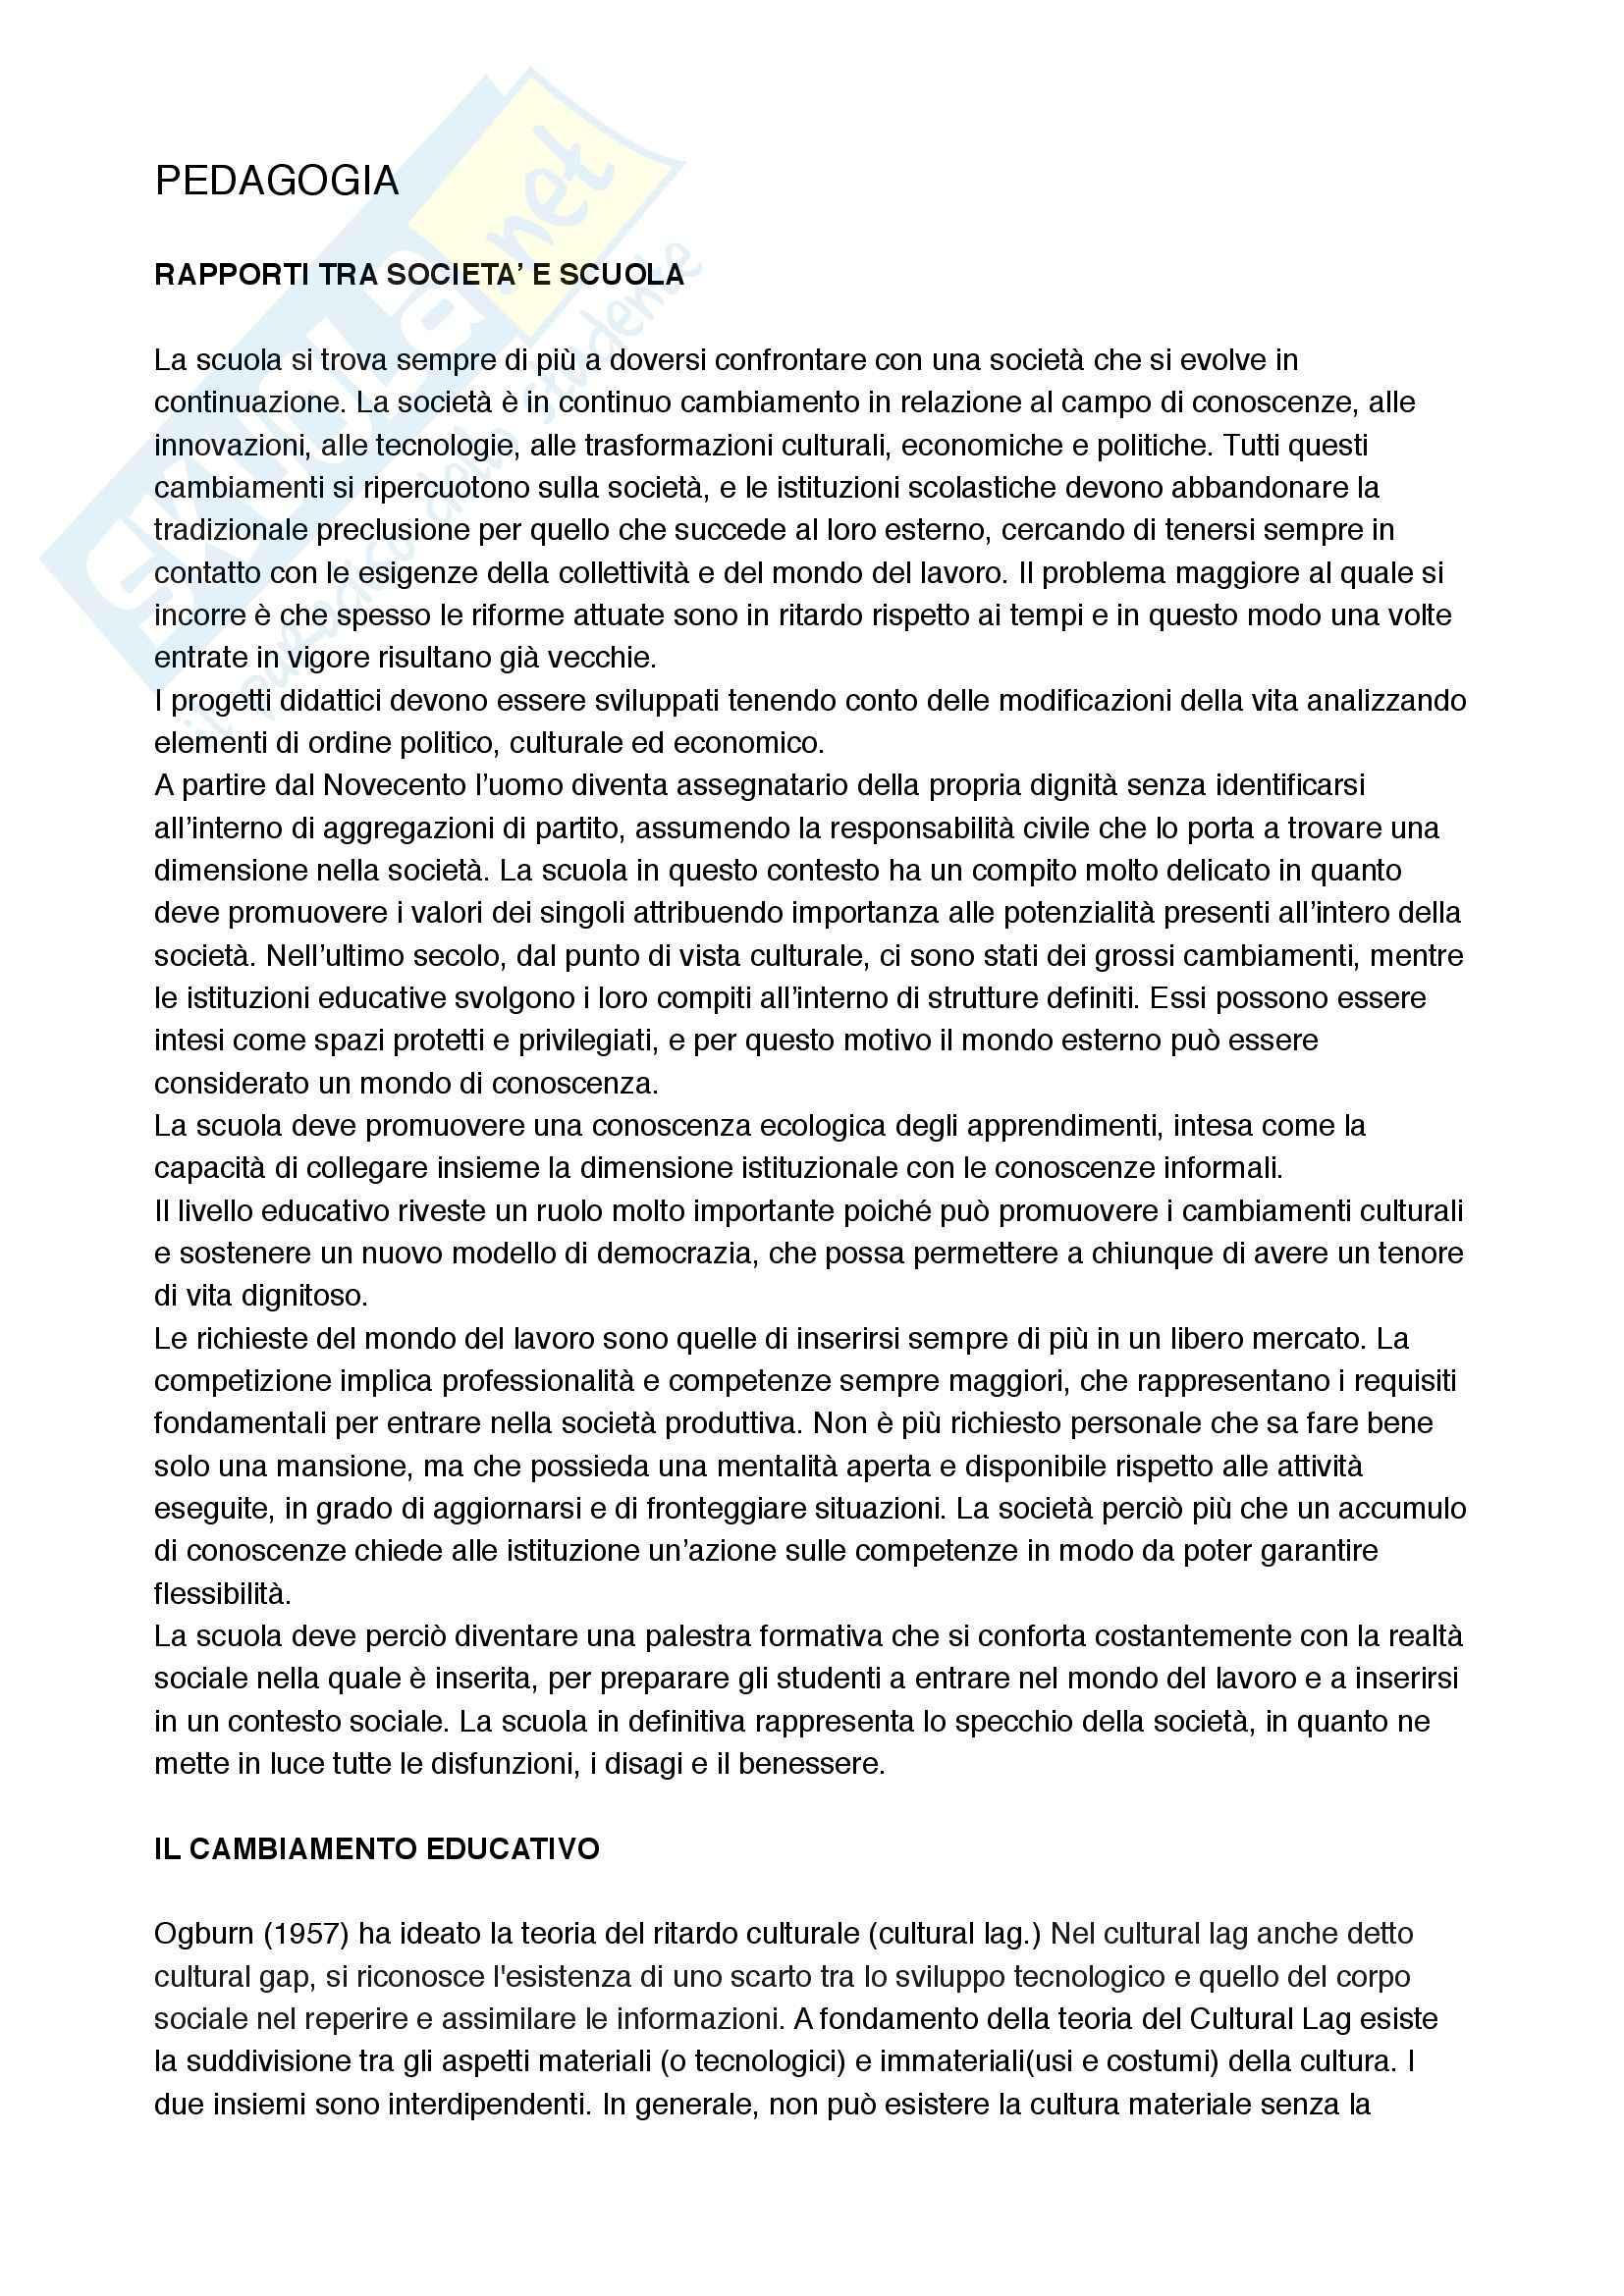 Autonomia scolastica e ricerca educativa, Pedagogia